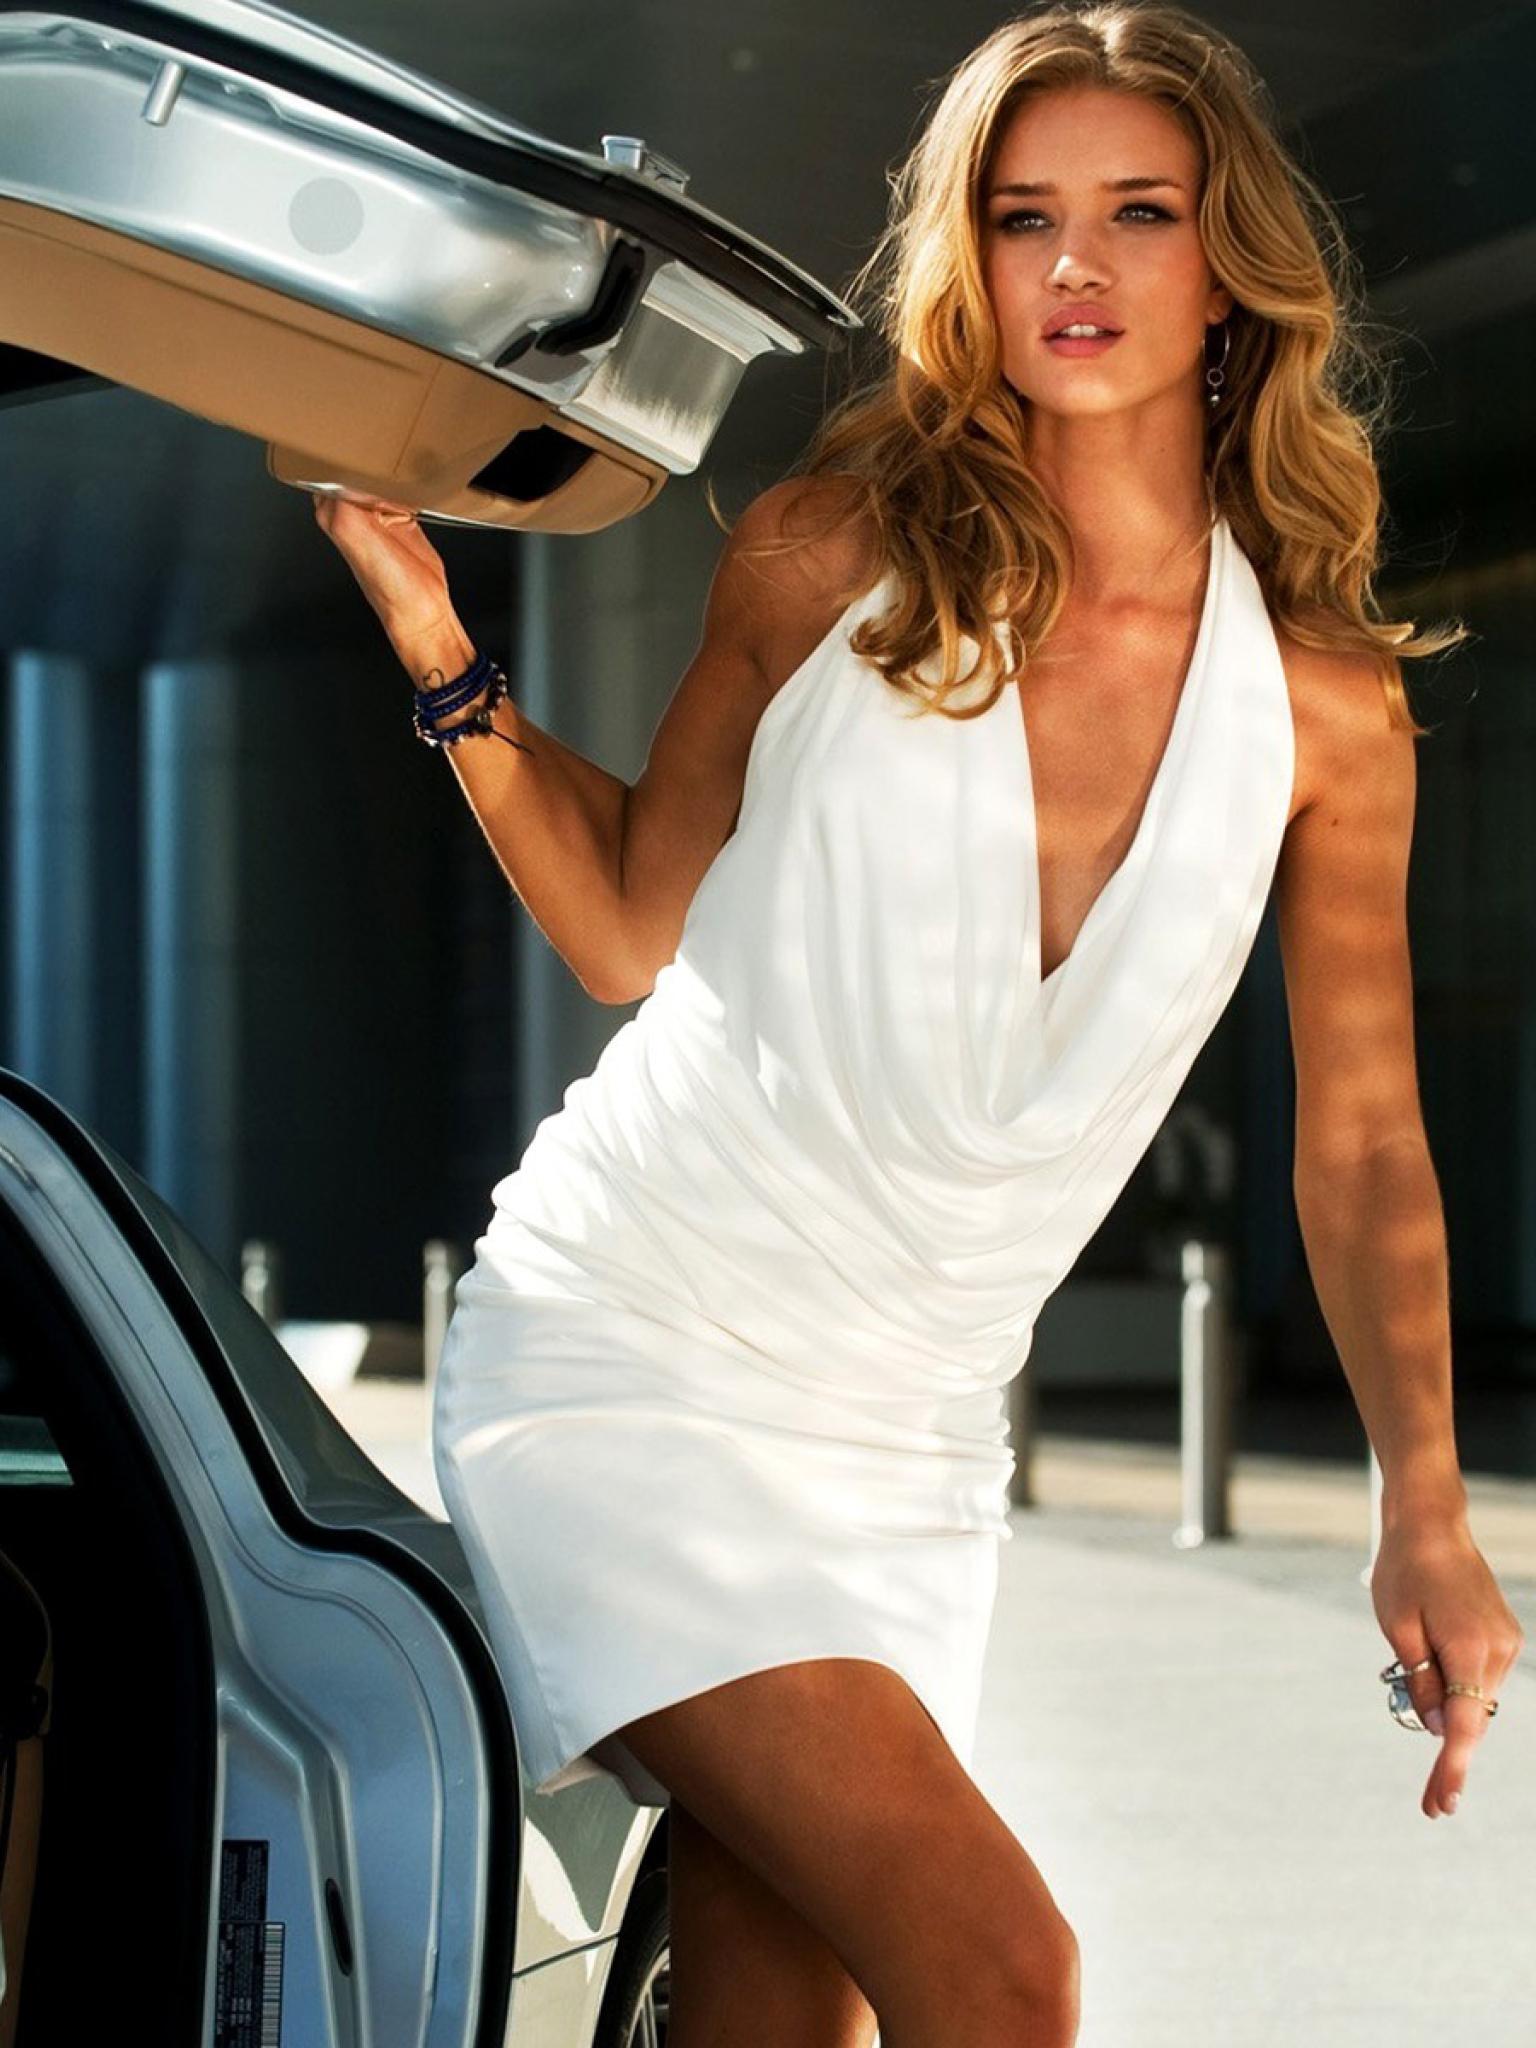 1536x2048 Rosie Huntington Whiteley In White With Car